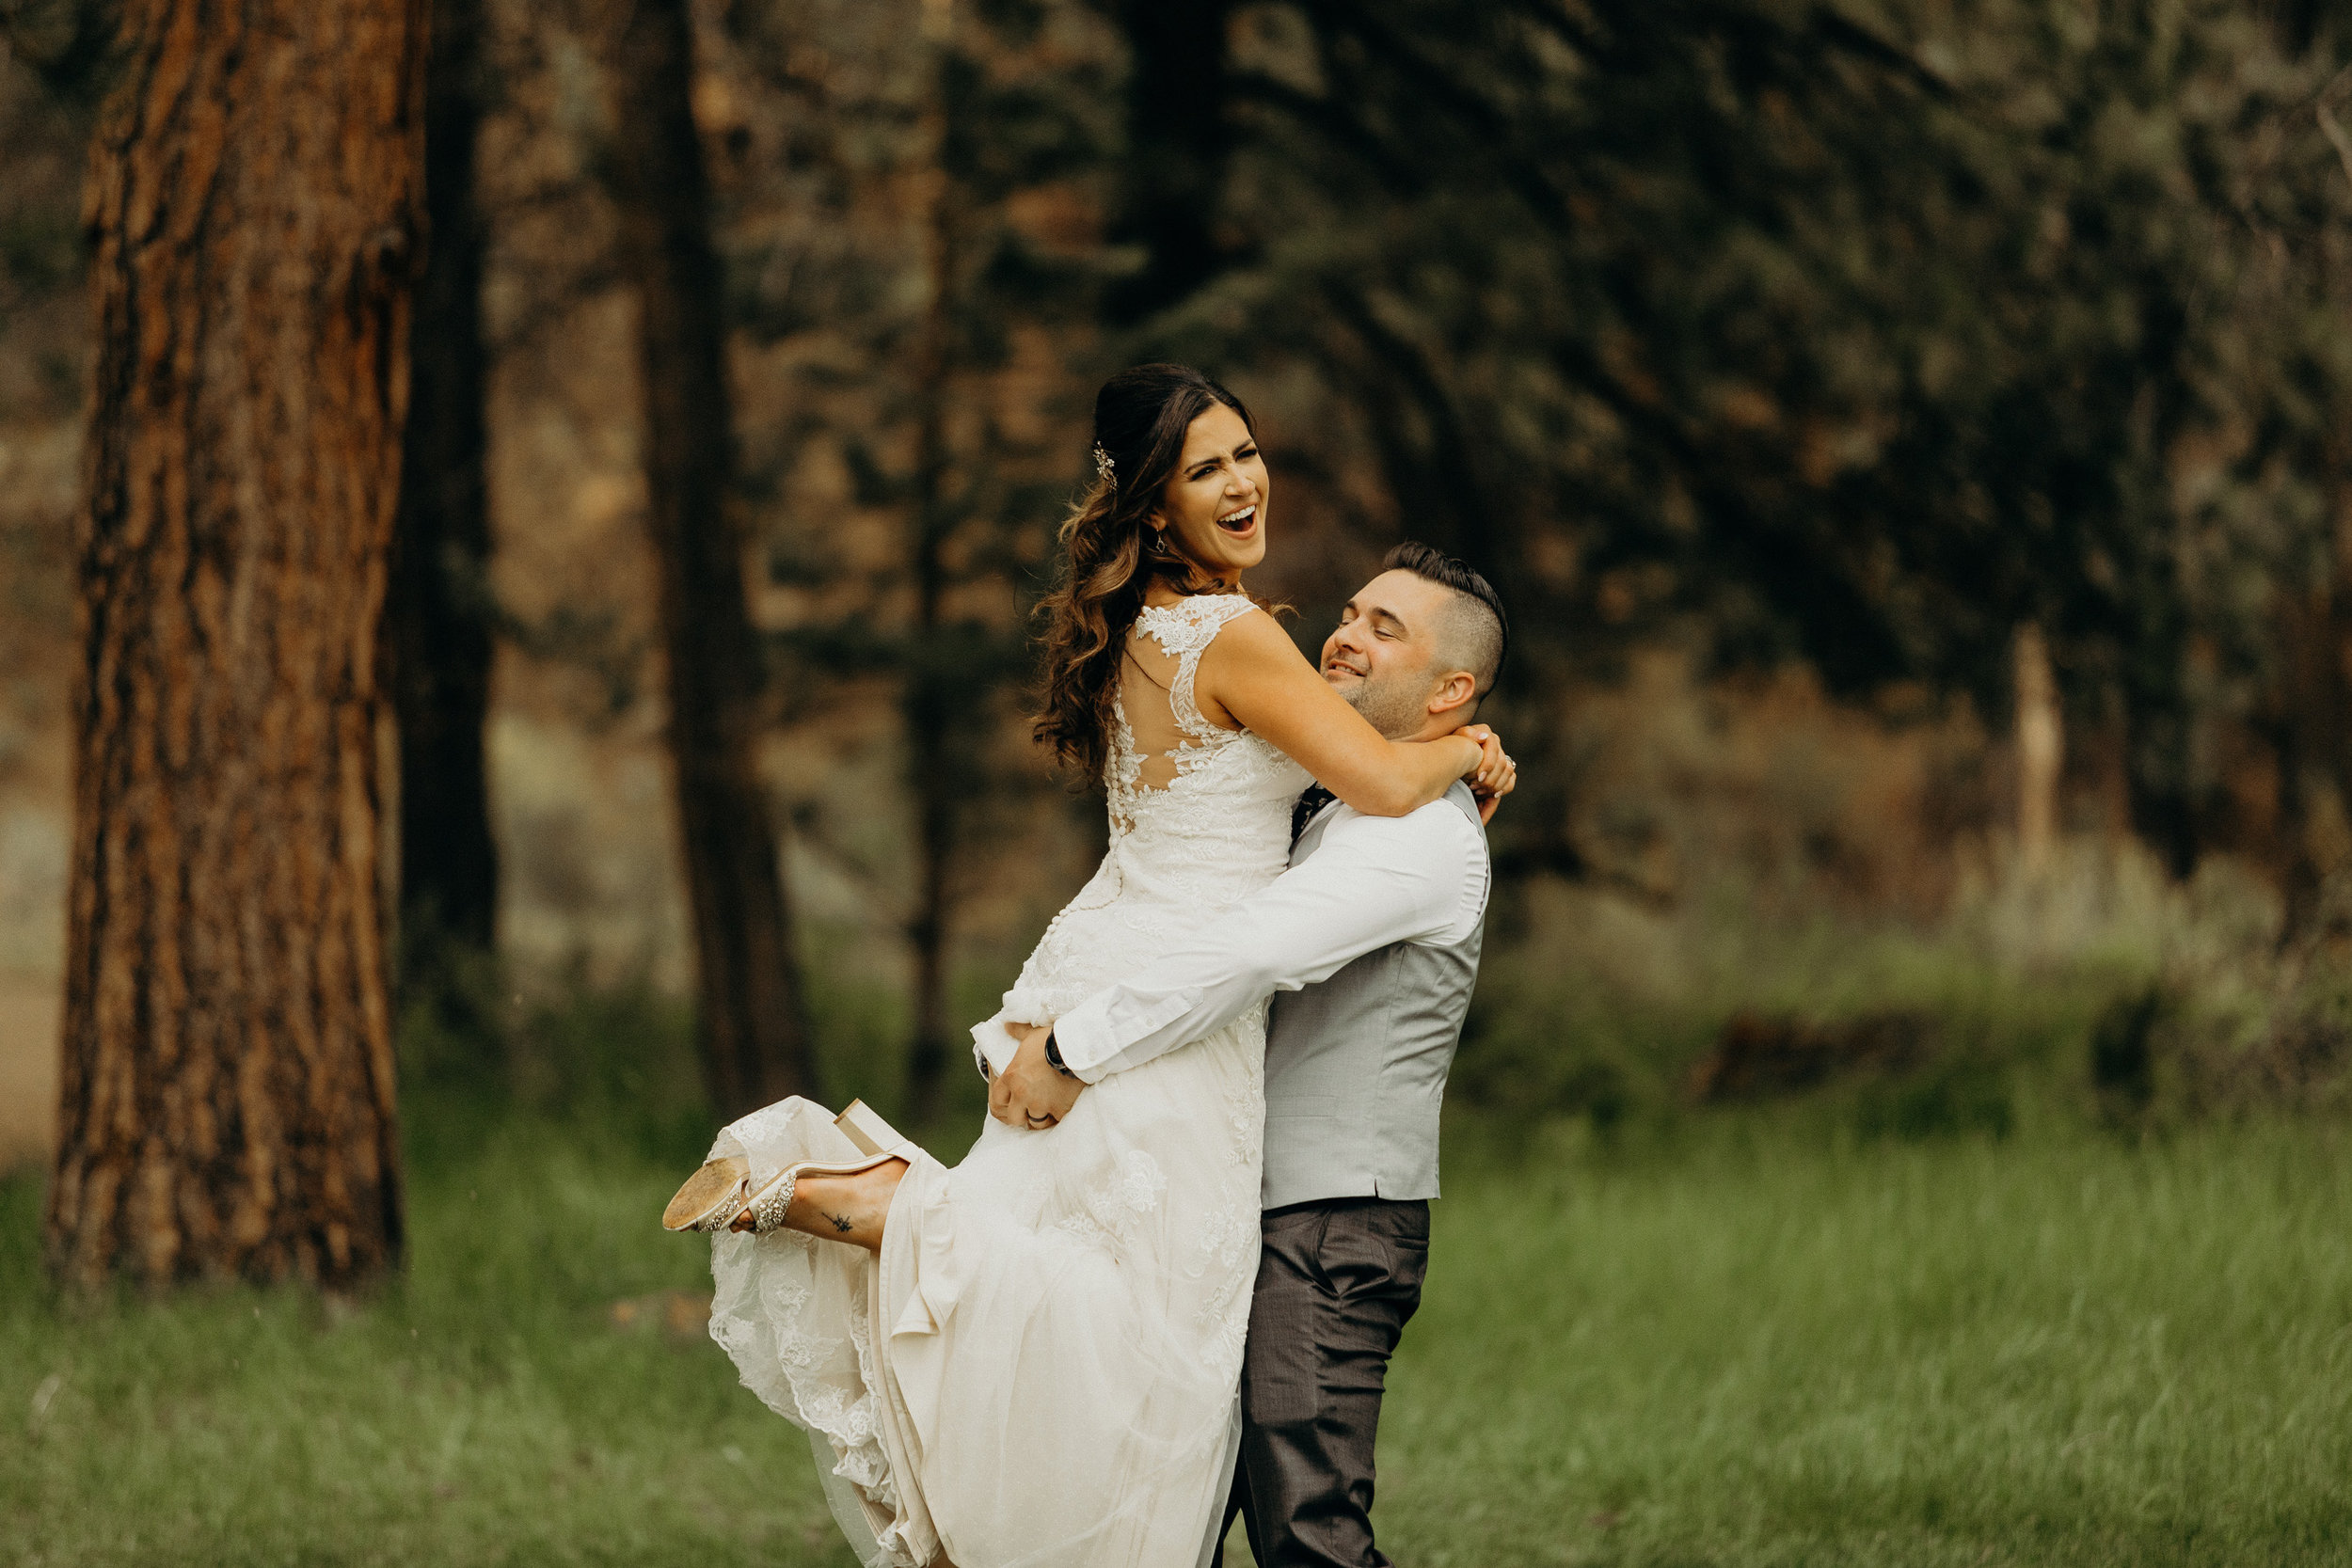 Brock + Caitlin Bend, Oregon Wedding 25.jpg